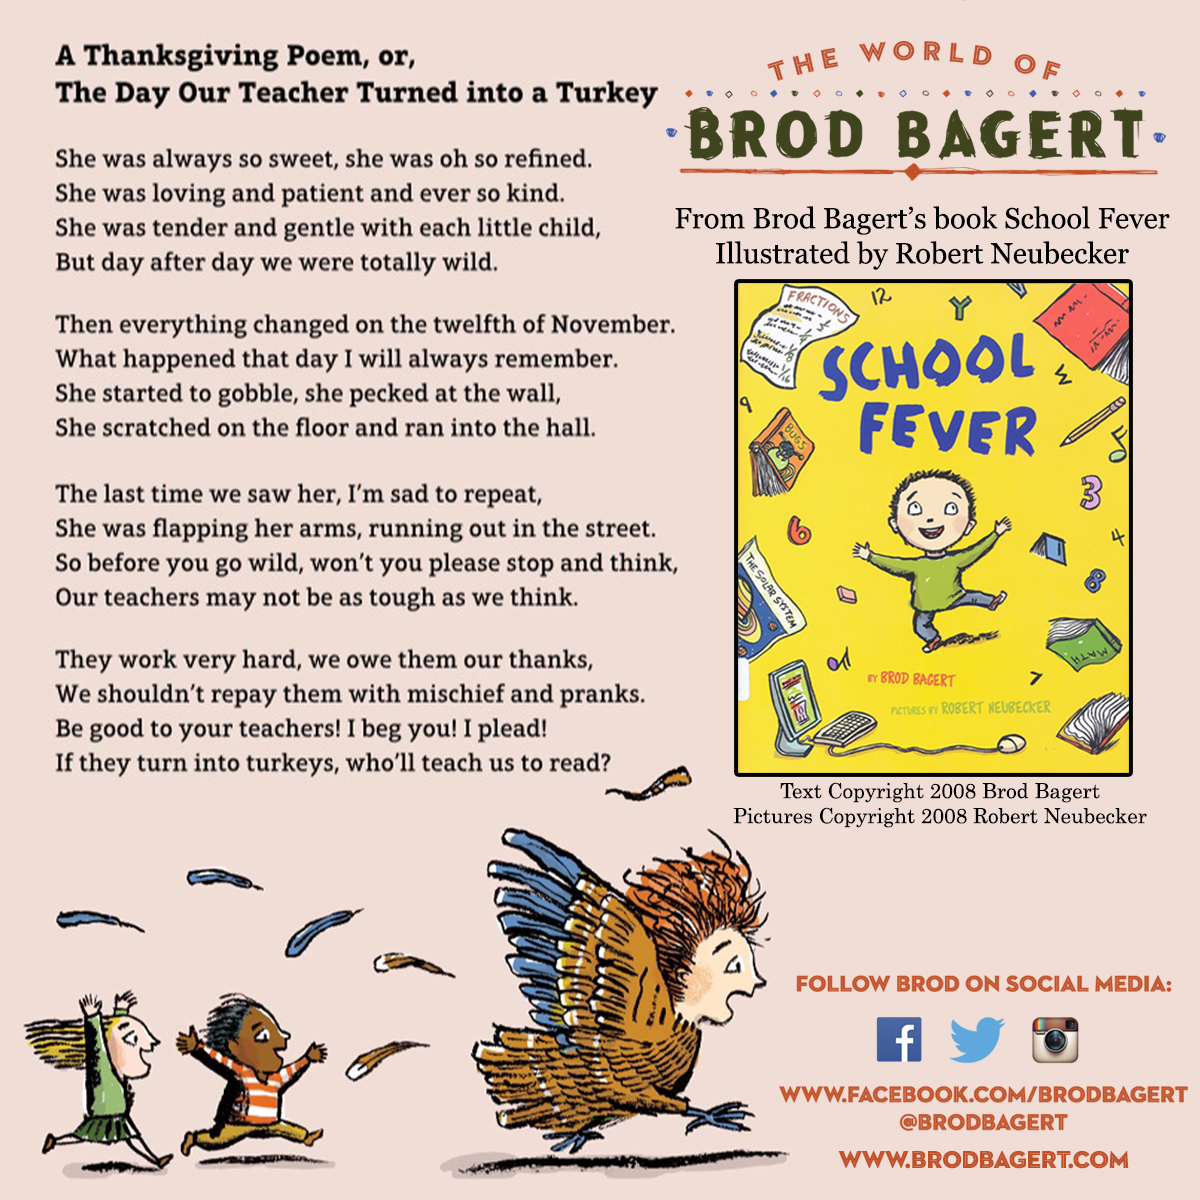 ThanksgivingPoem_SchoolFever